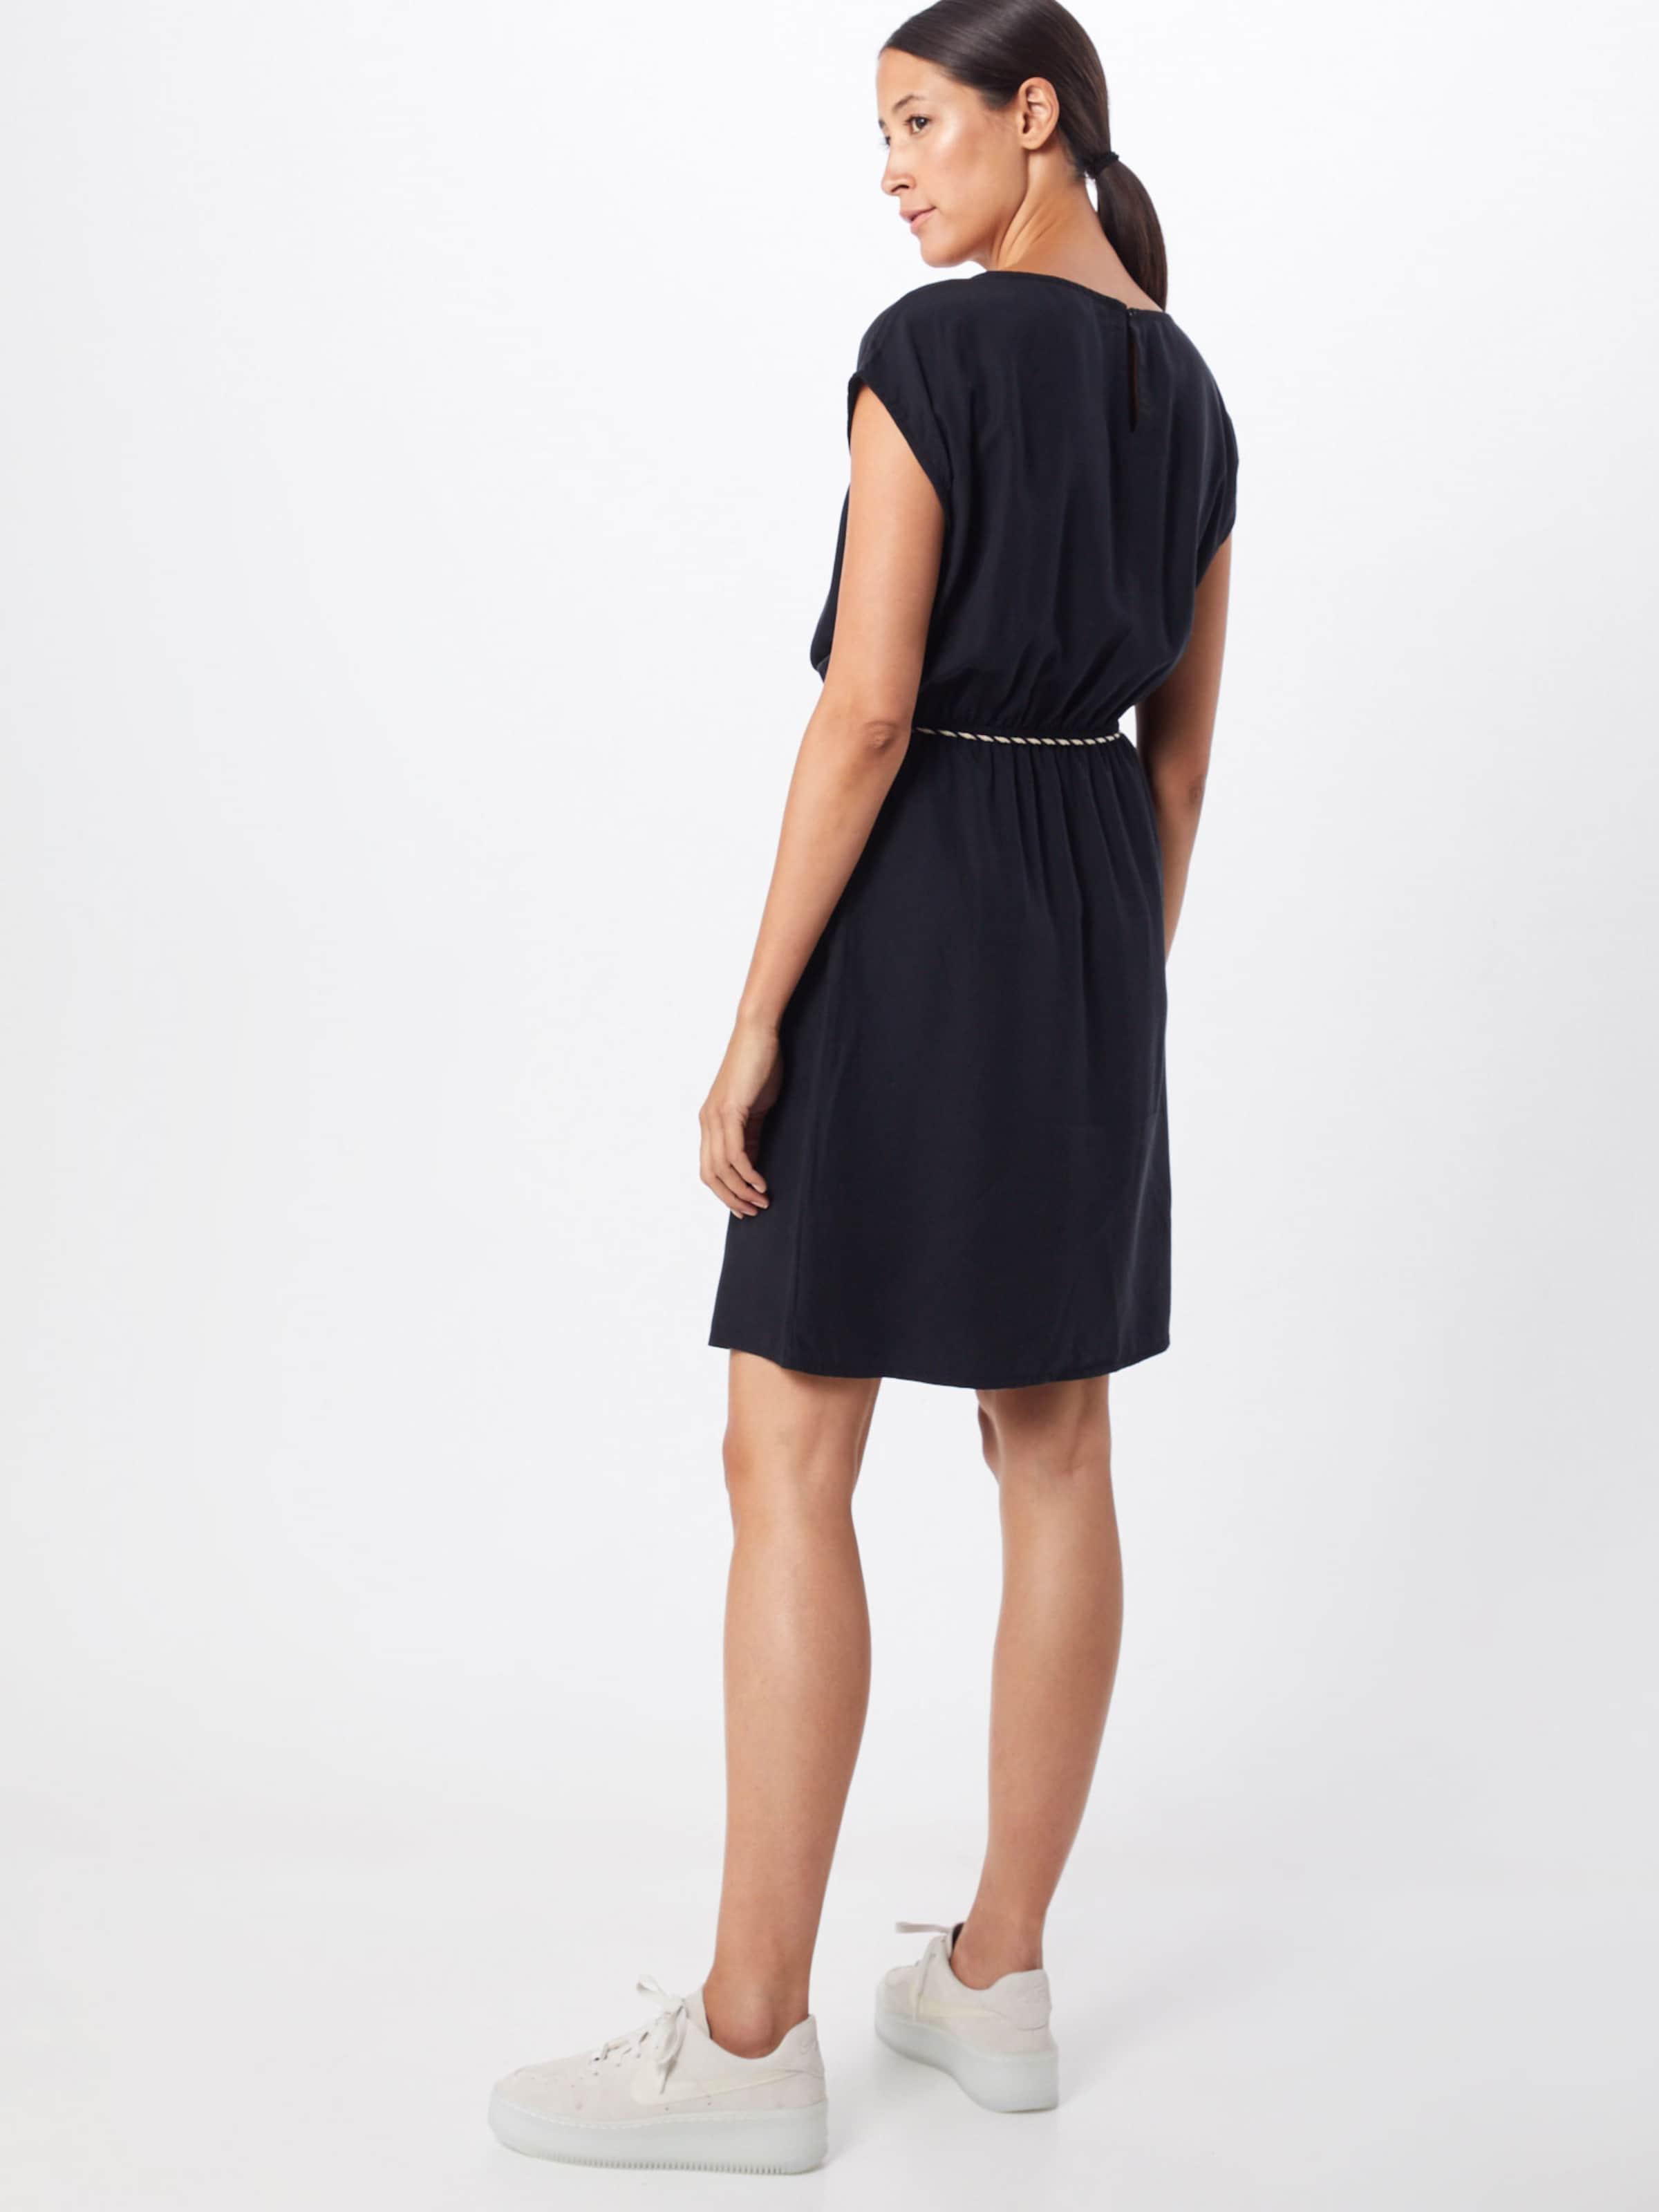 Esprit Kleid In 'r tencel' Schwarz 67Ygyvbf